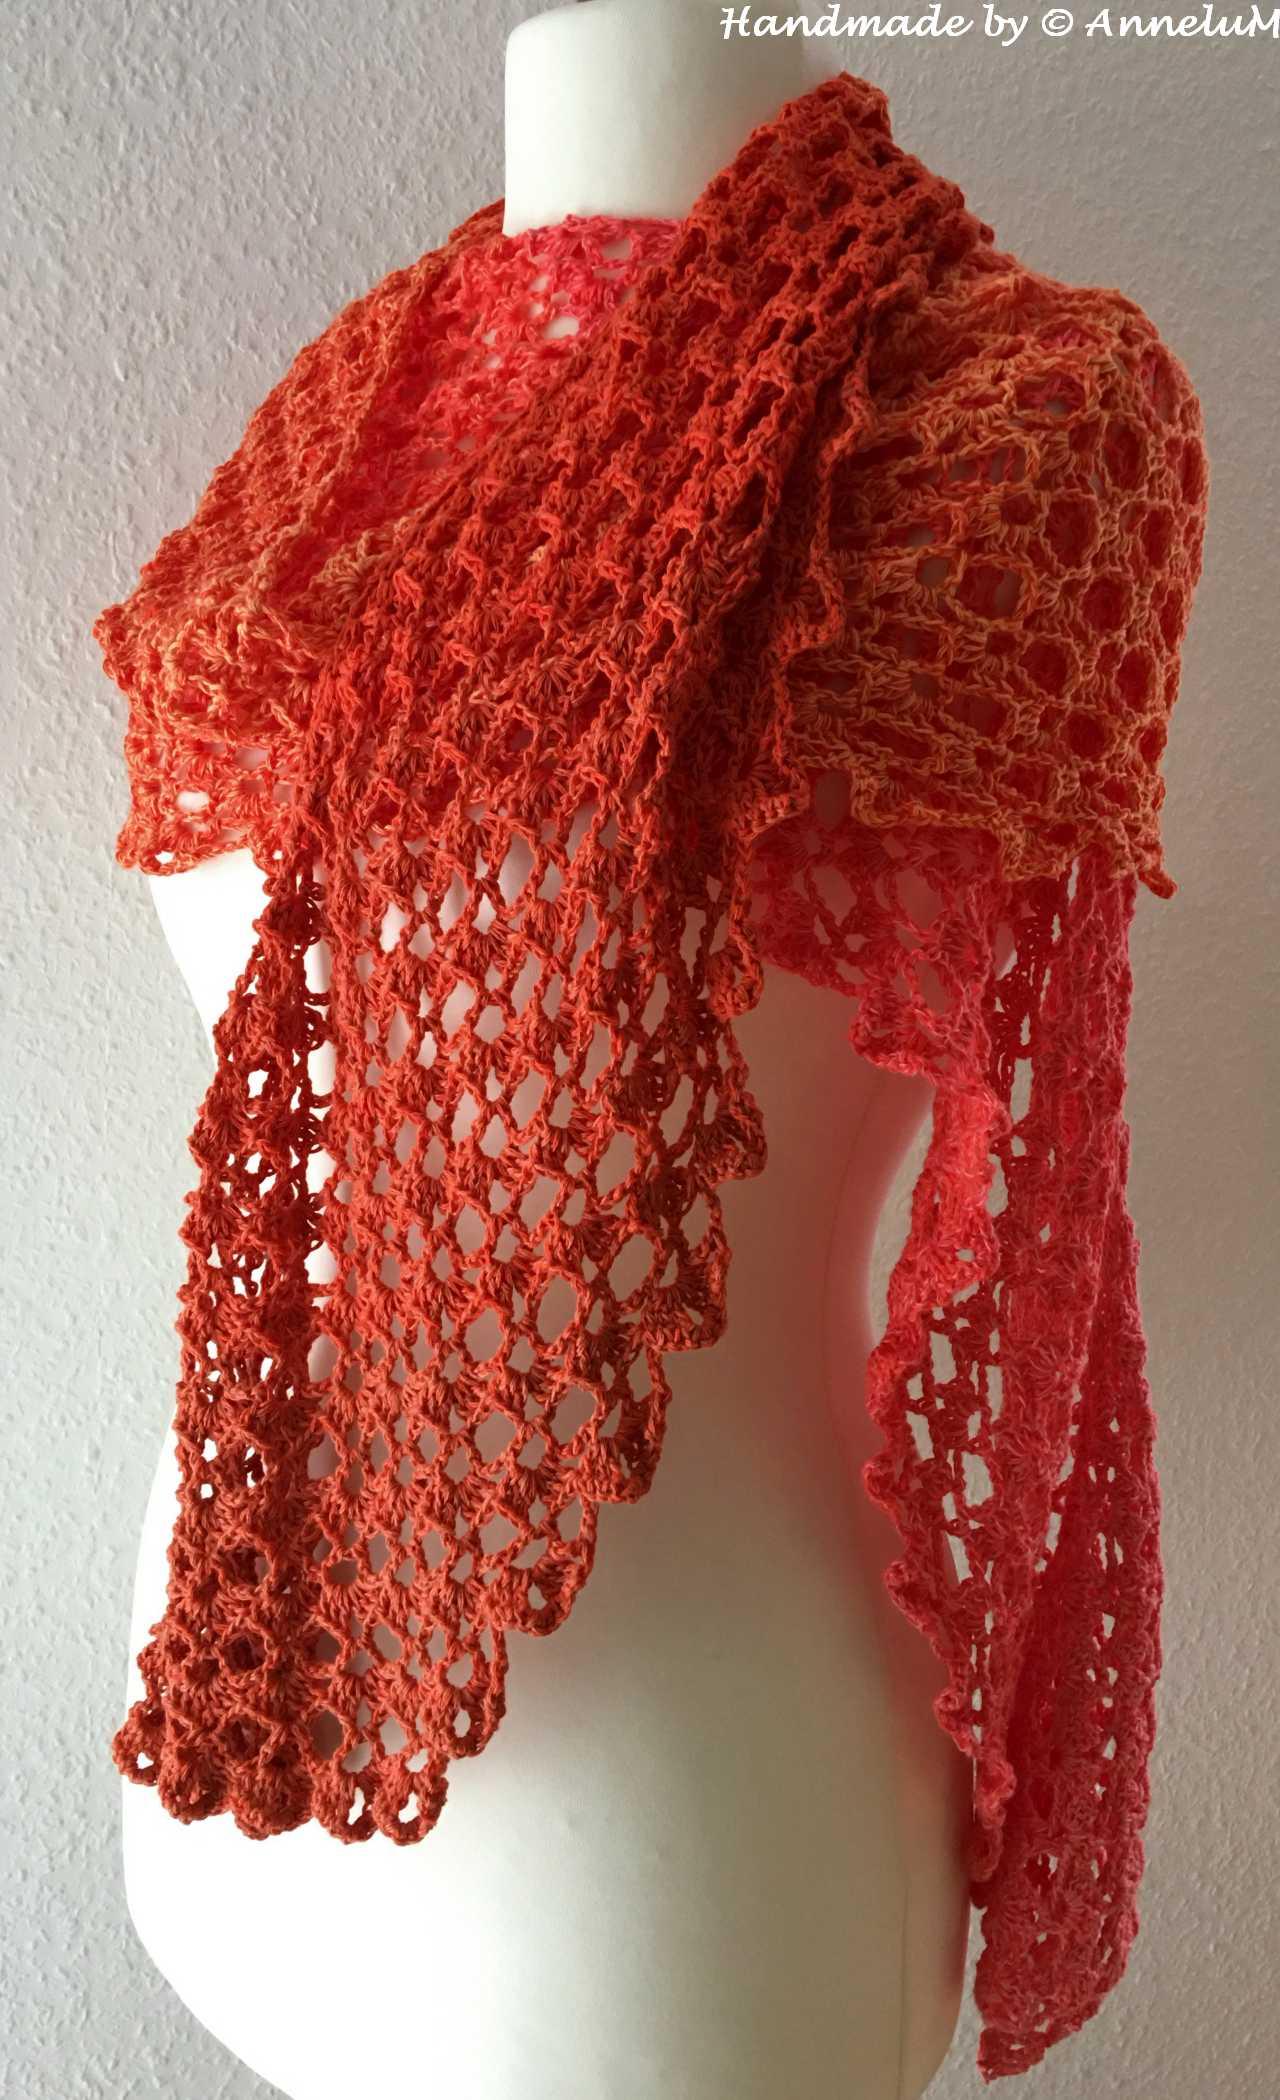 Celair Handmade by AnneluM